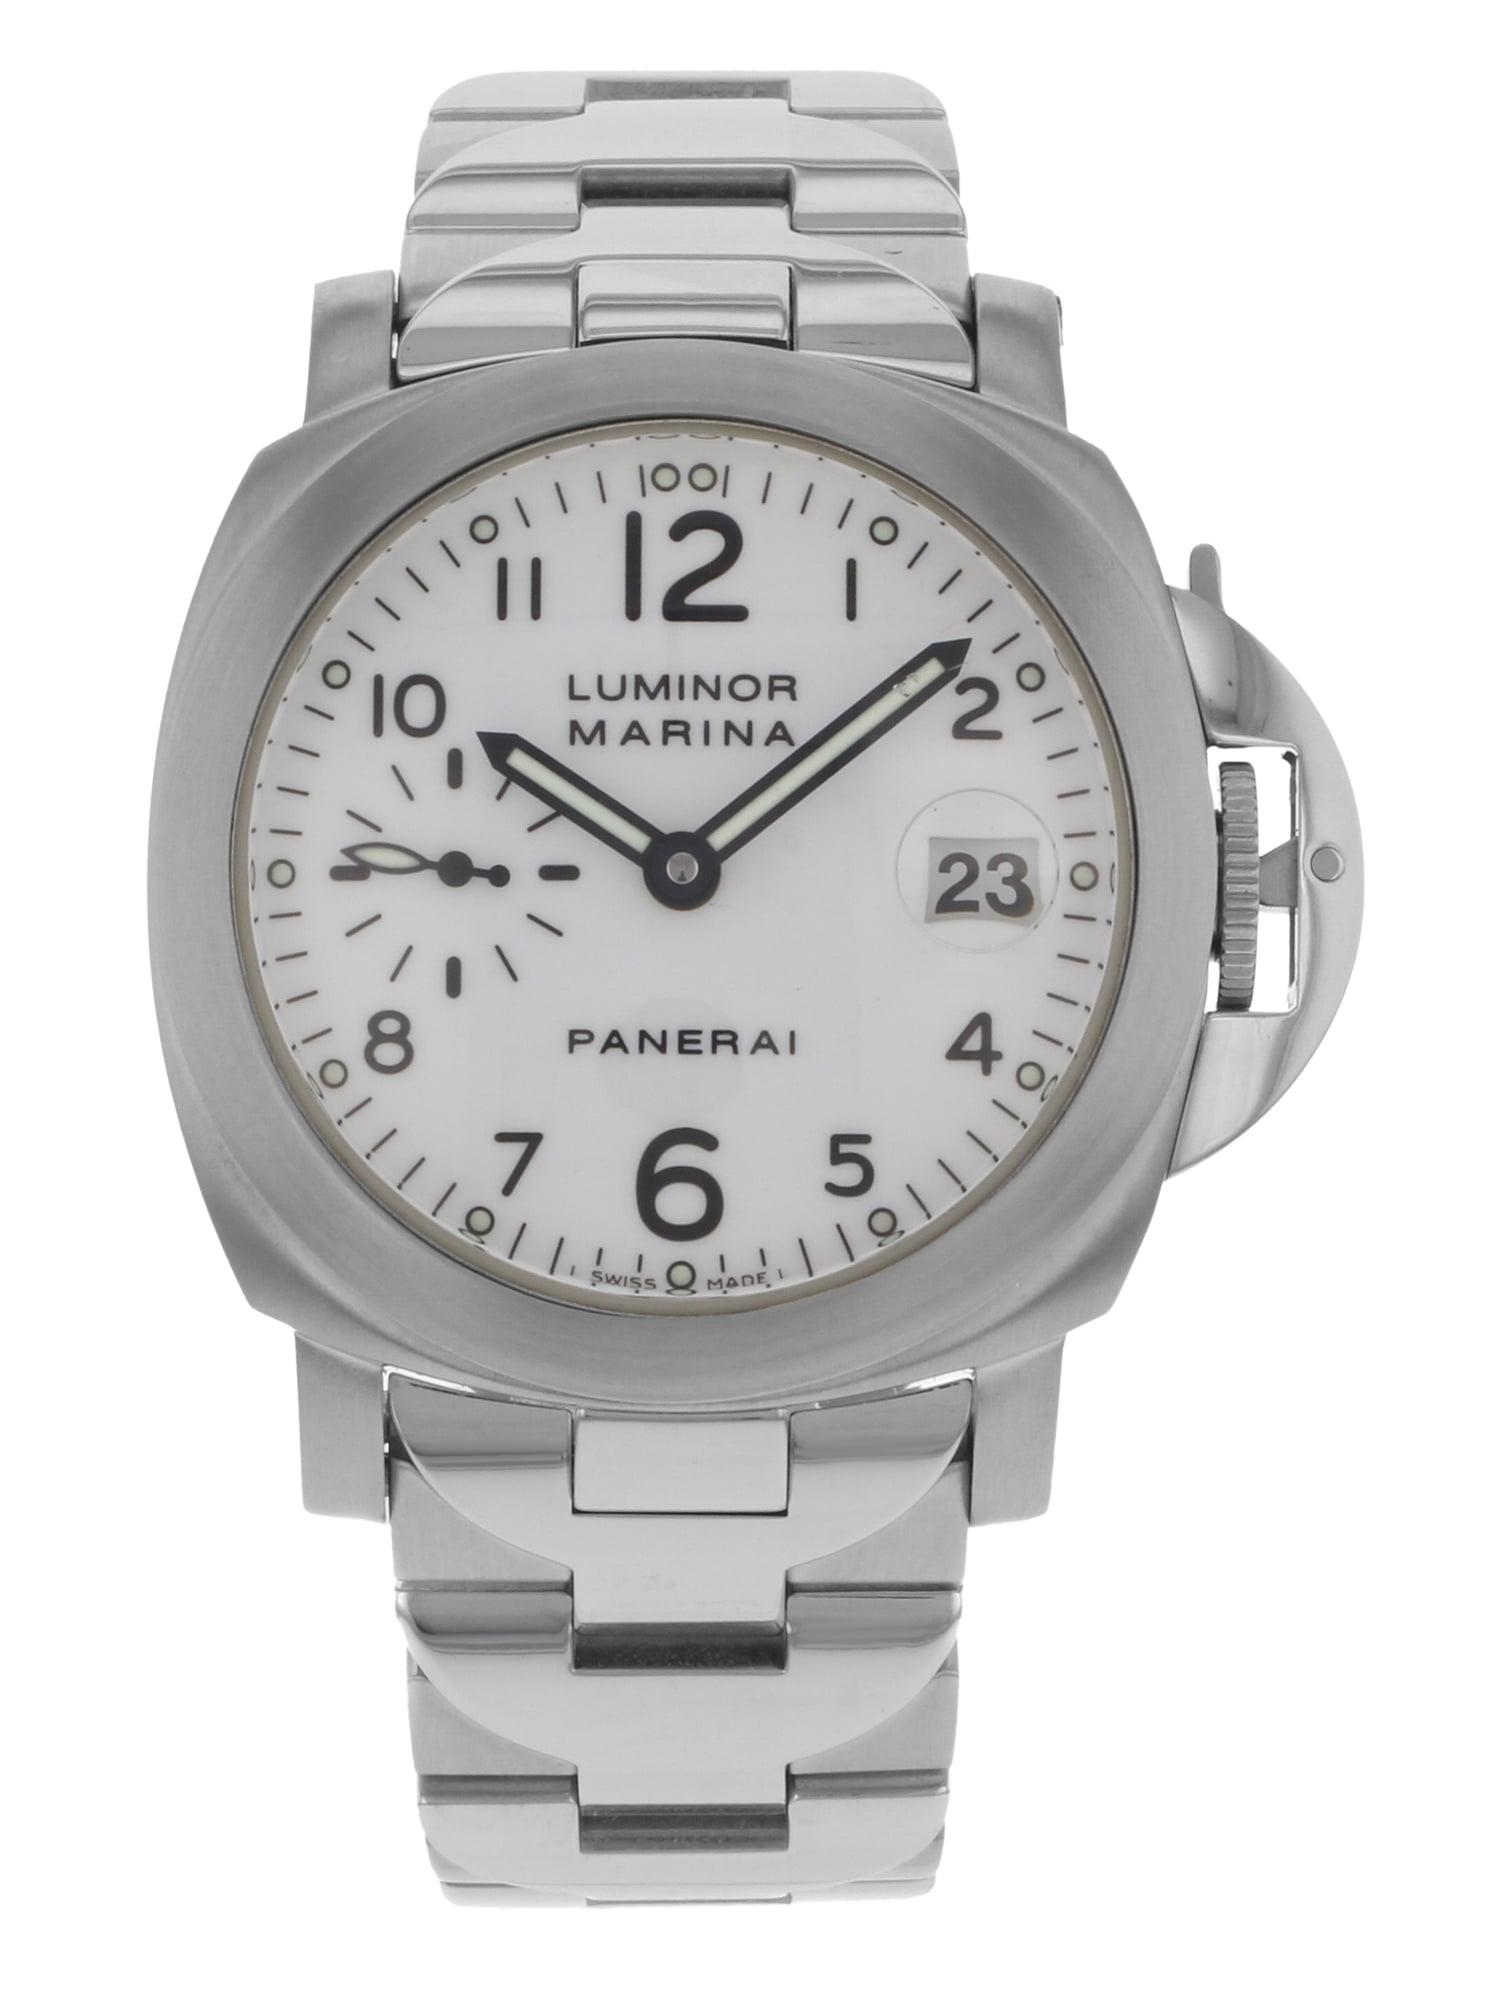 Pre-Owned Panerai Luminor Marina PAM00051 Stainless Steel Automatic Men's Watch